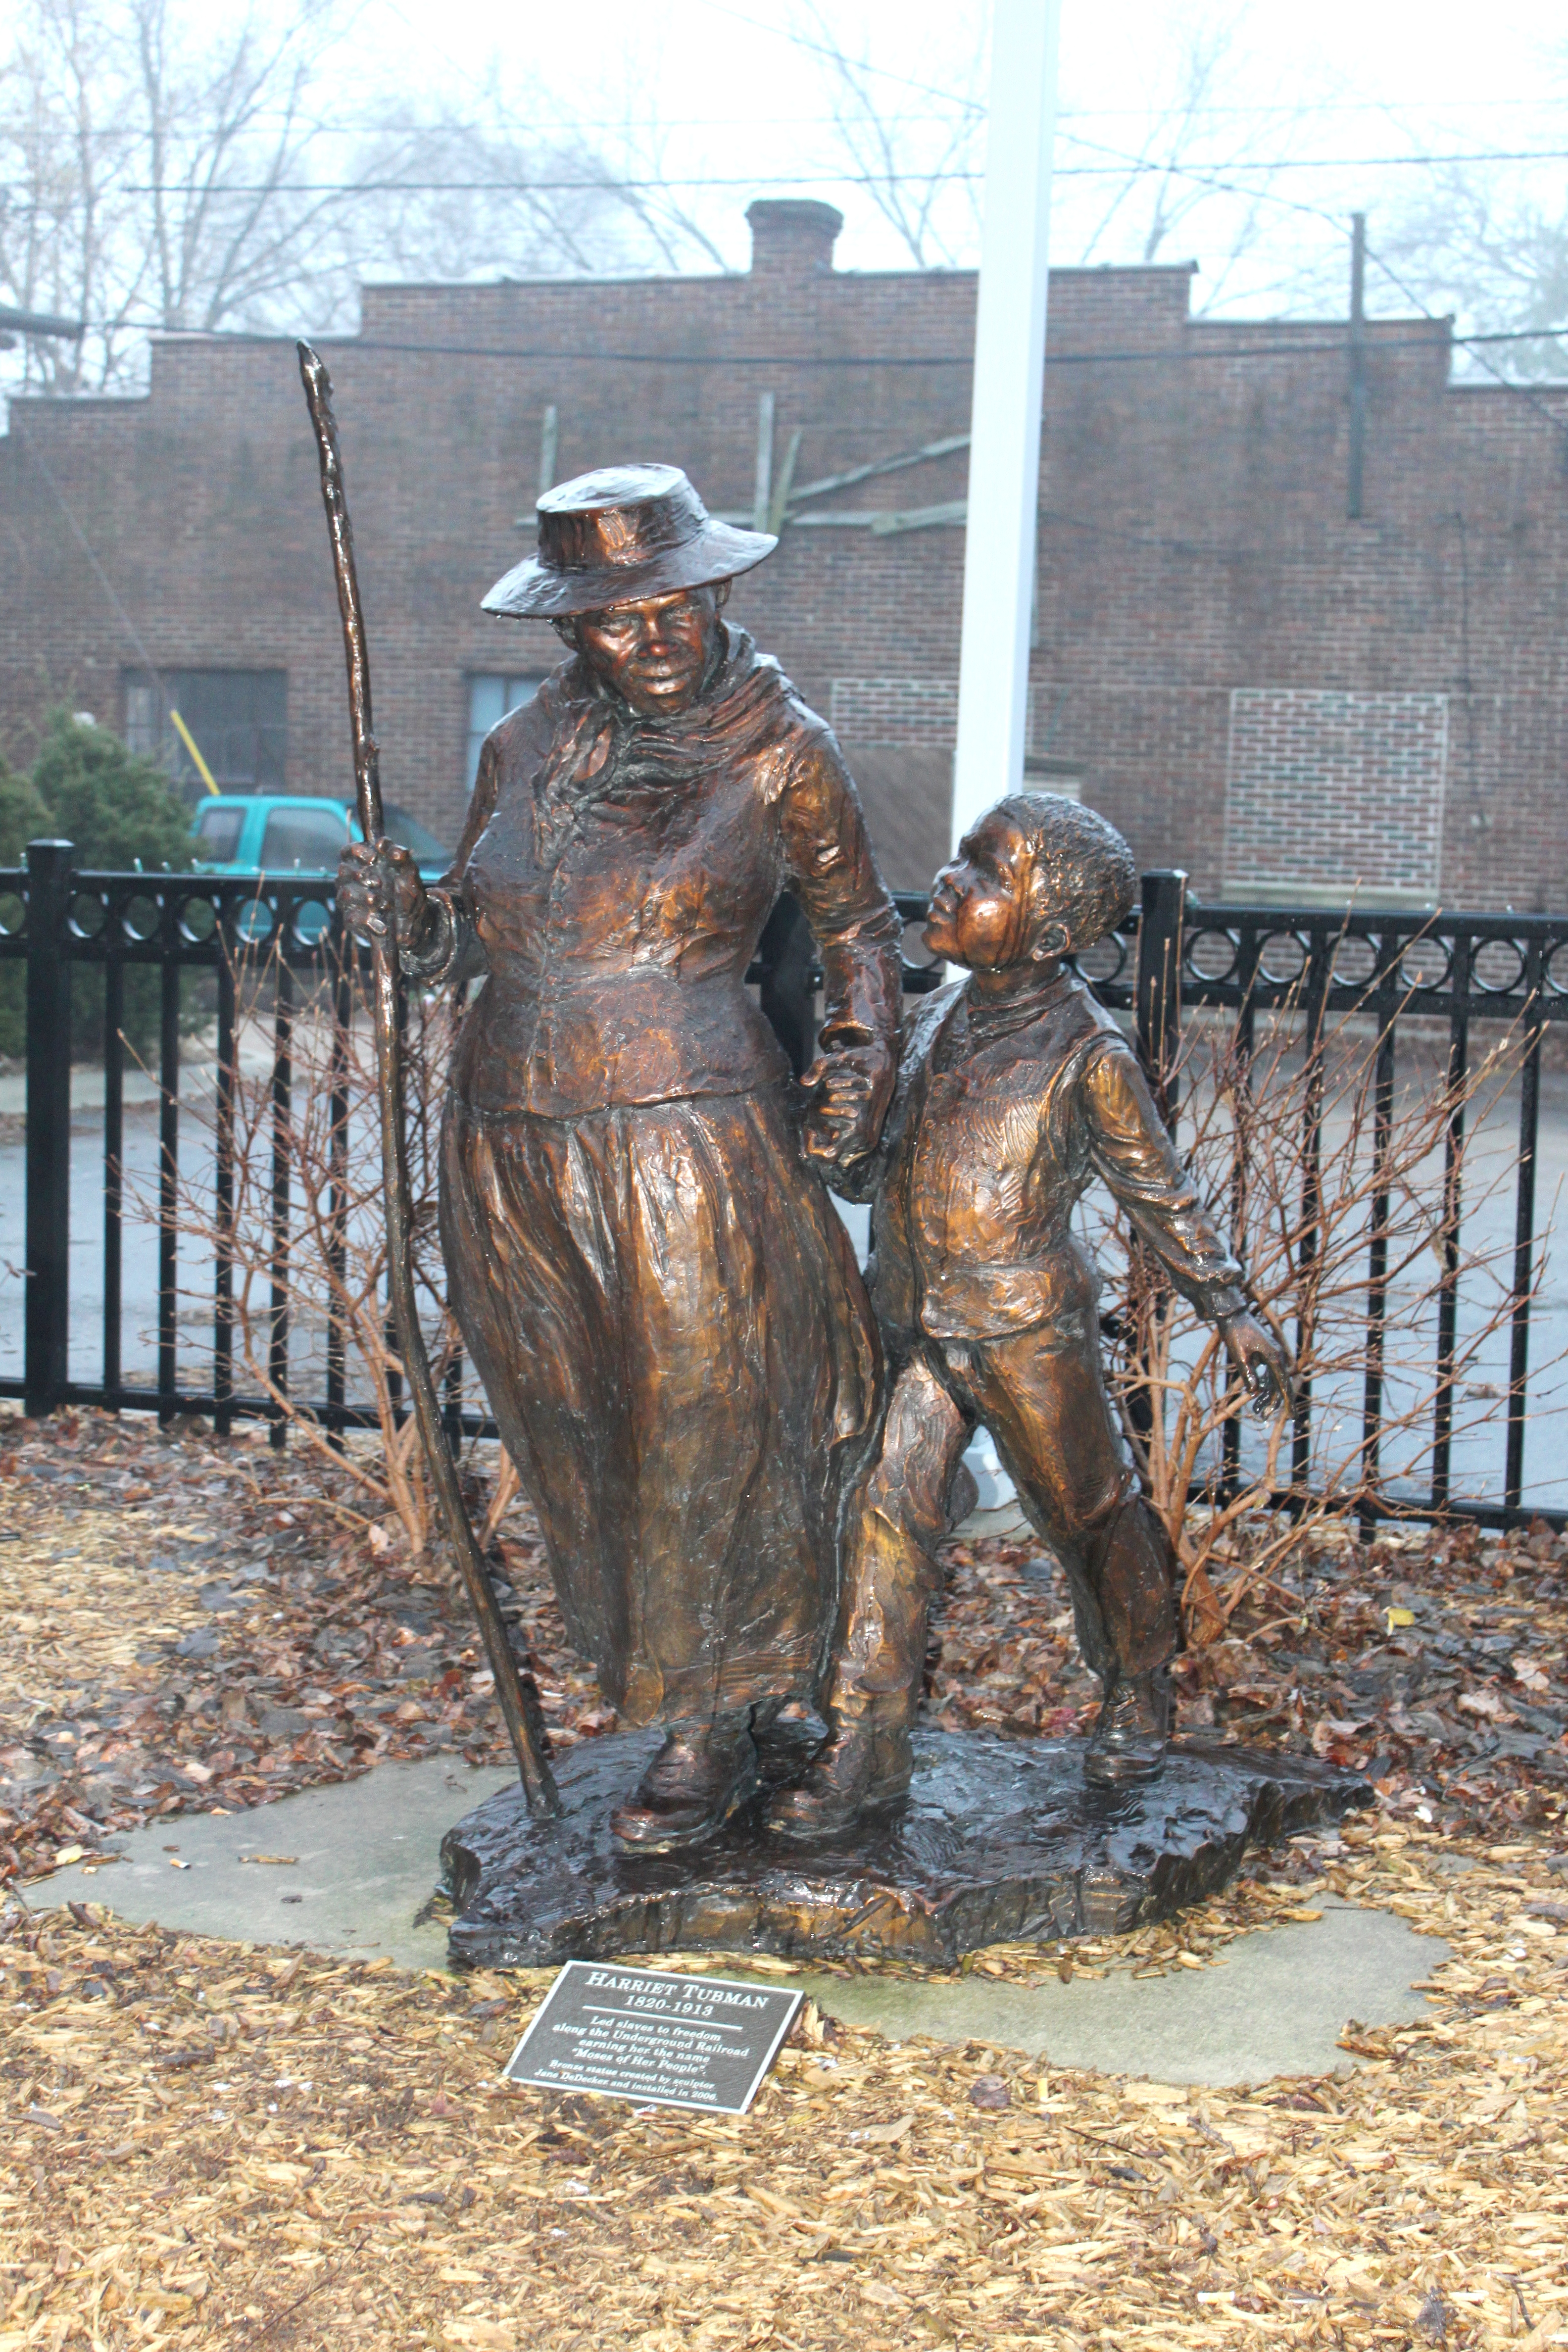 Statue_of_Harriet_Tubman_Ypsilanti_Michigan (1).jpg